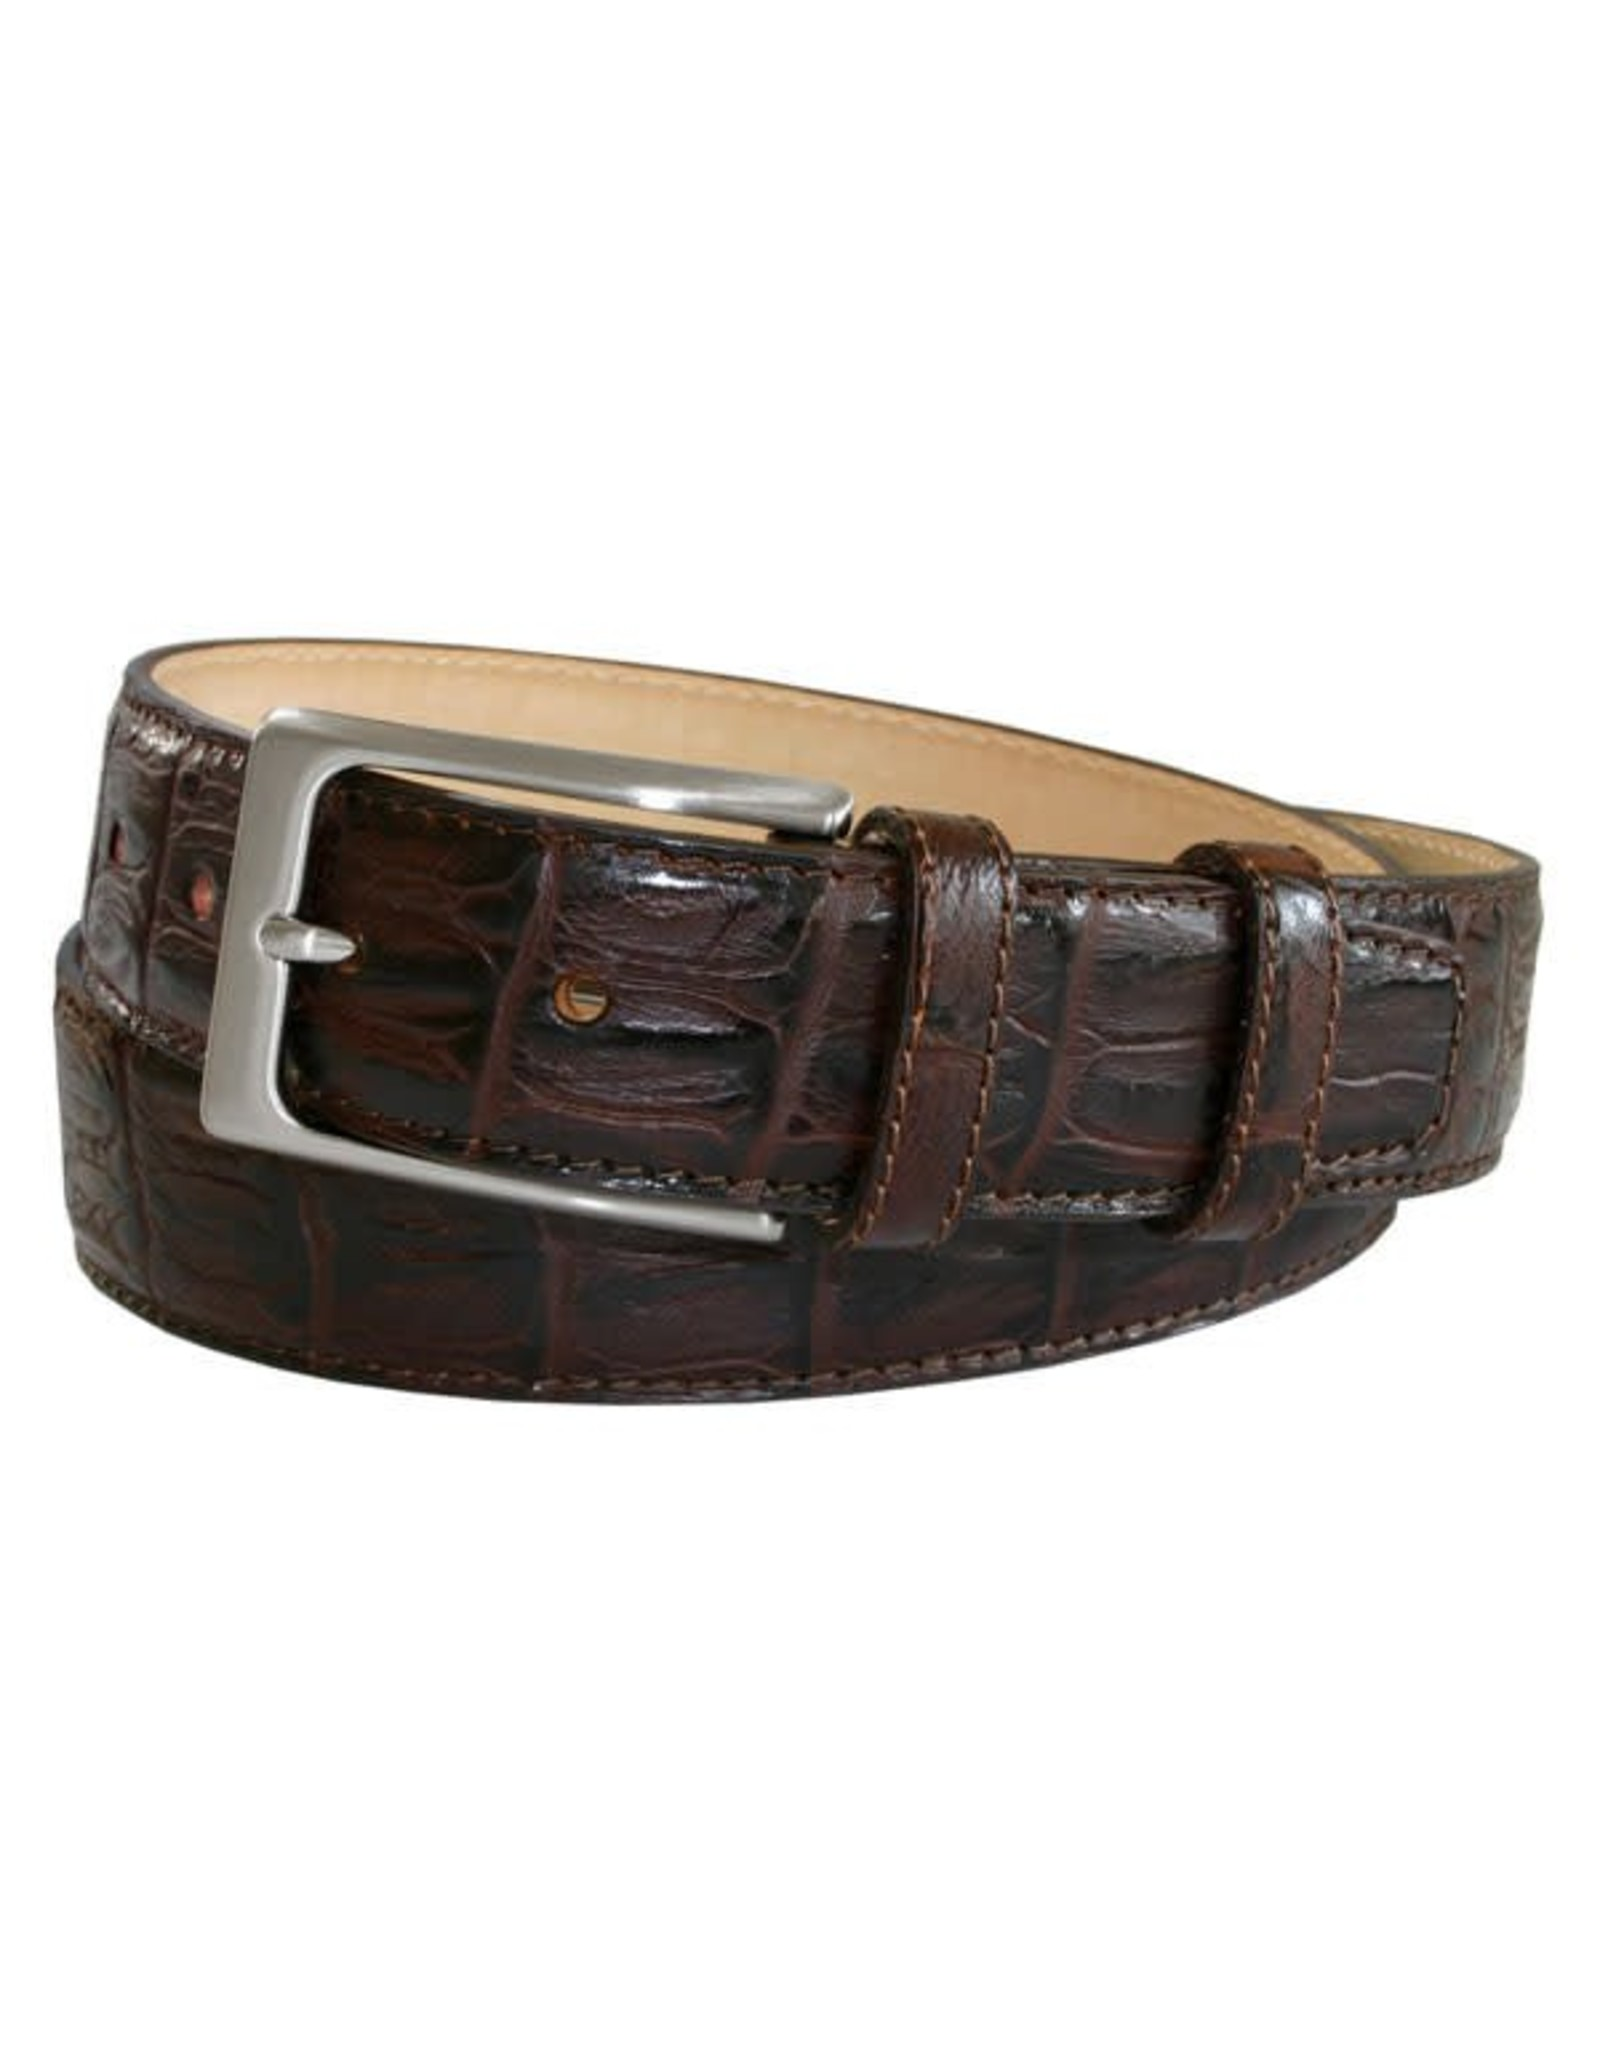 Robert Charles Croc Belt